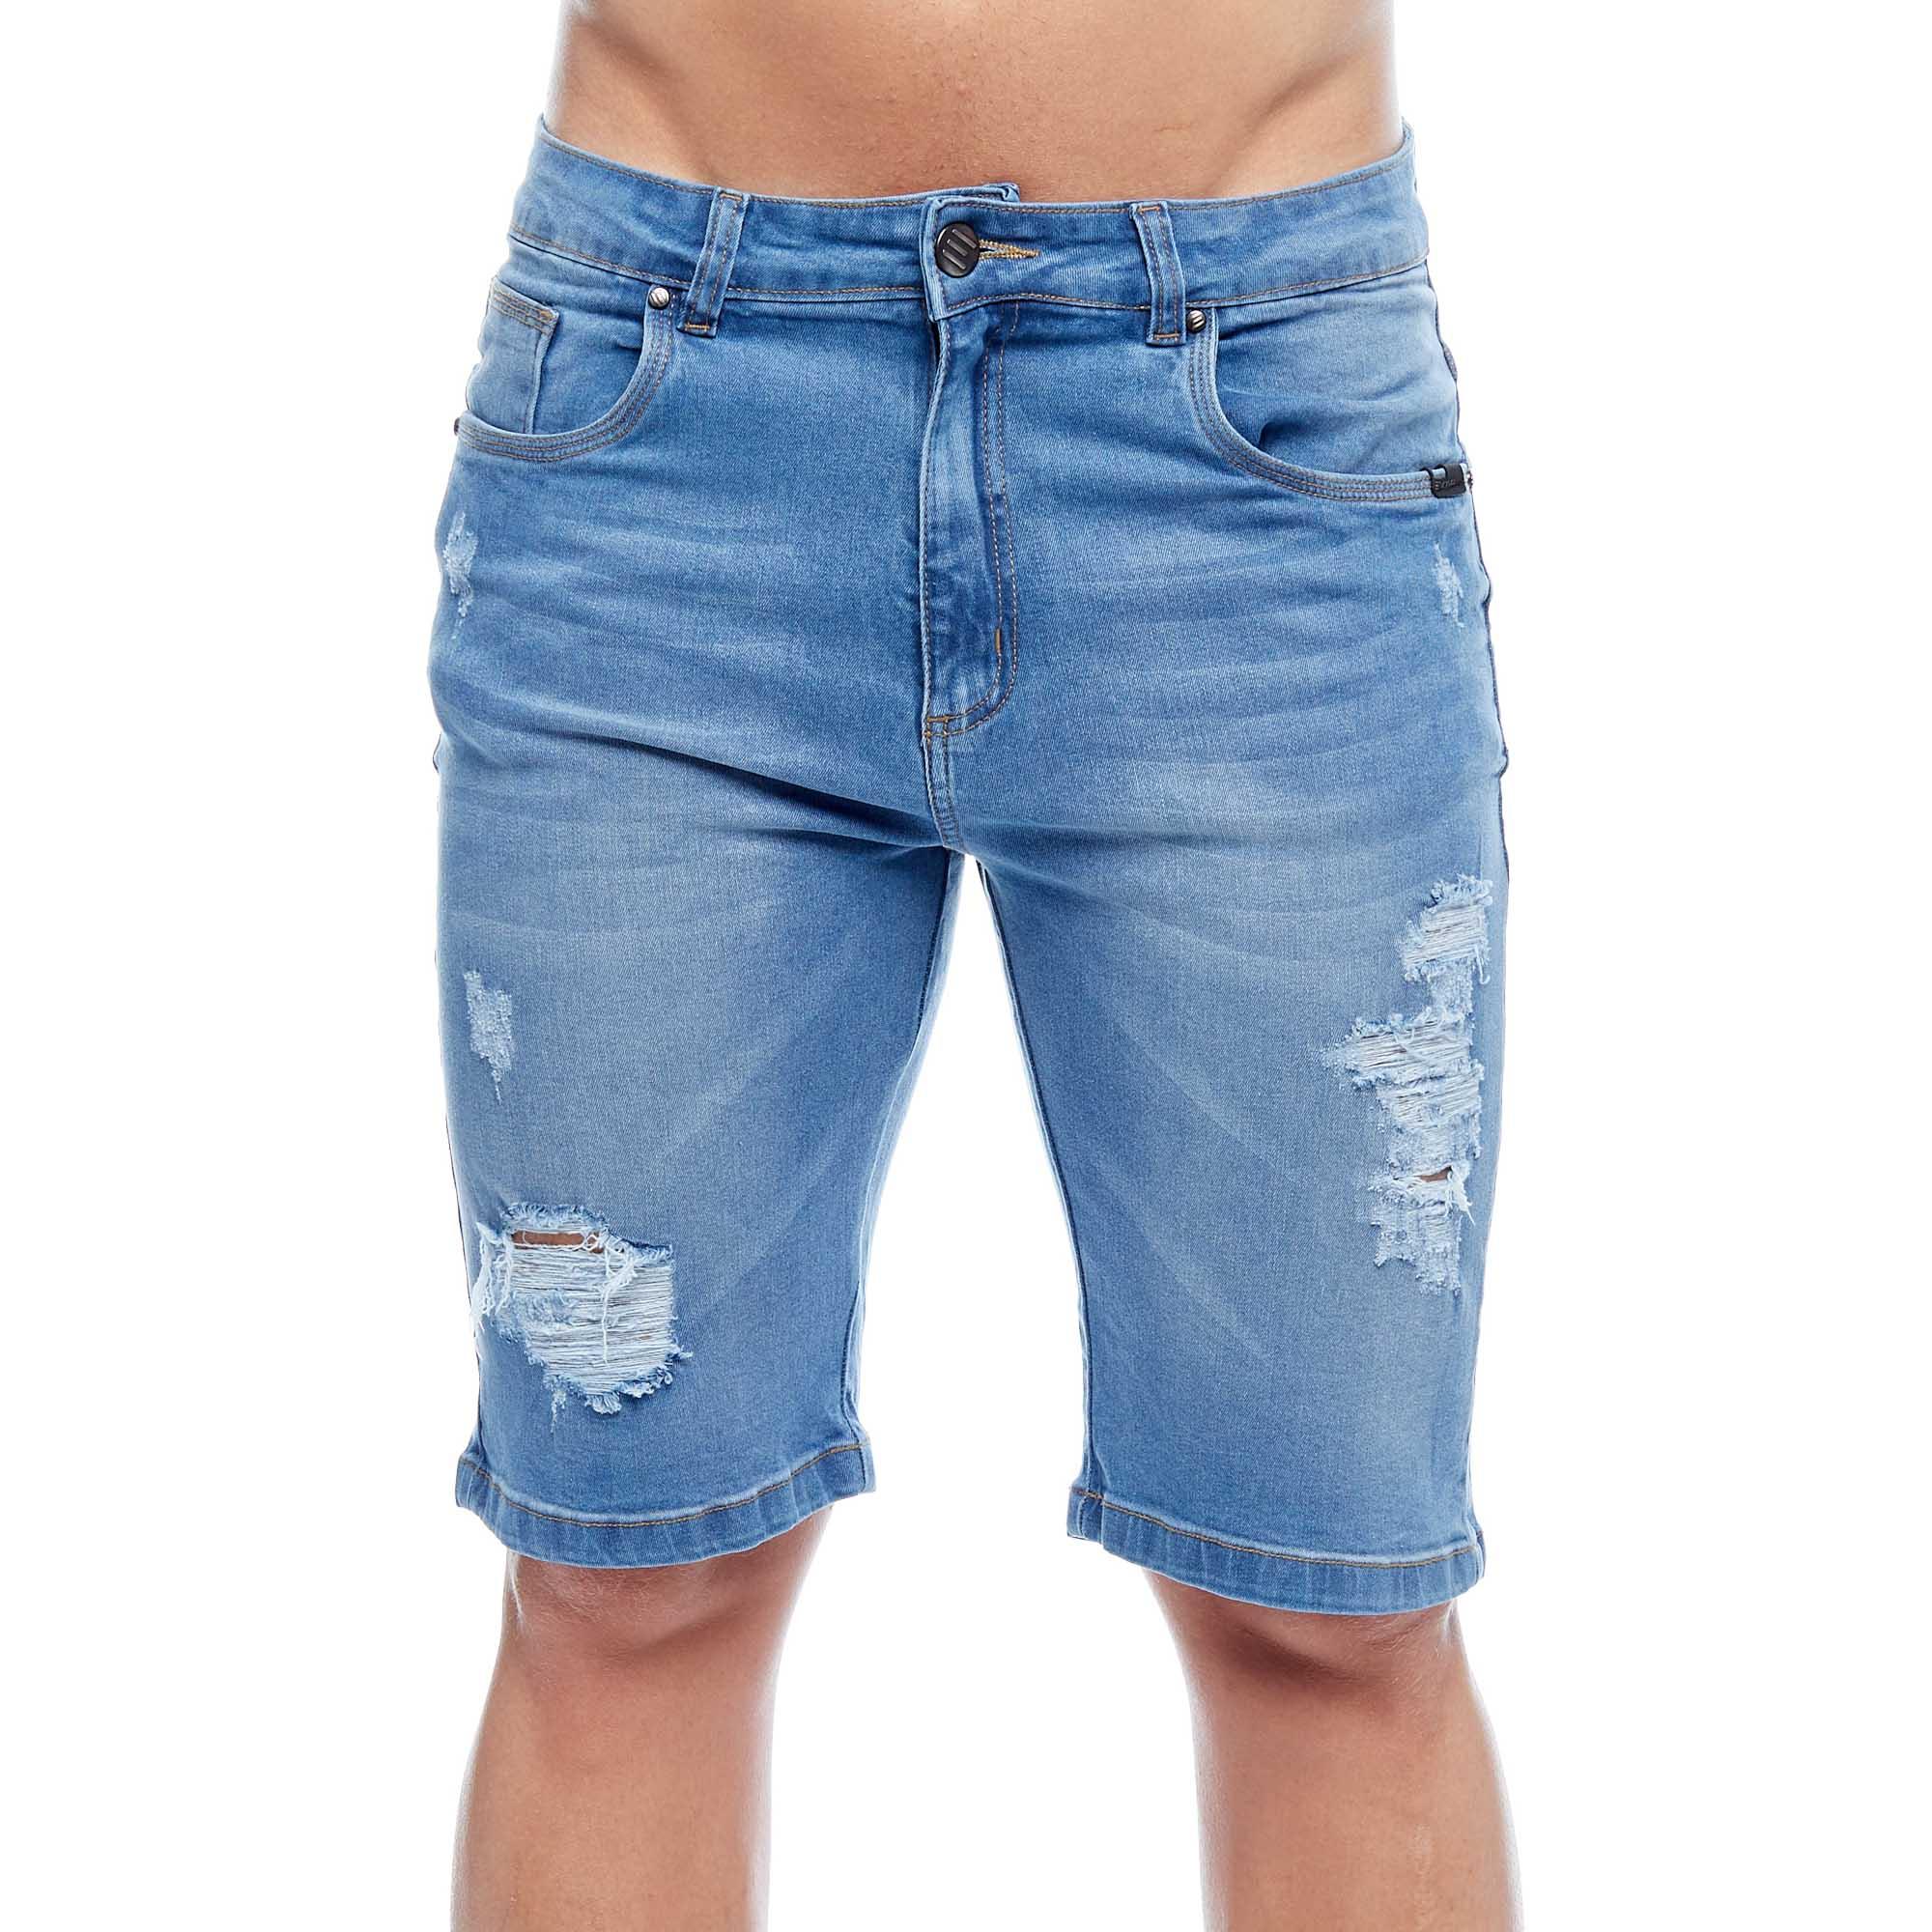 Bermuda Jeans Evolvee  Slim Straight